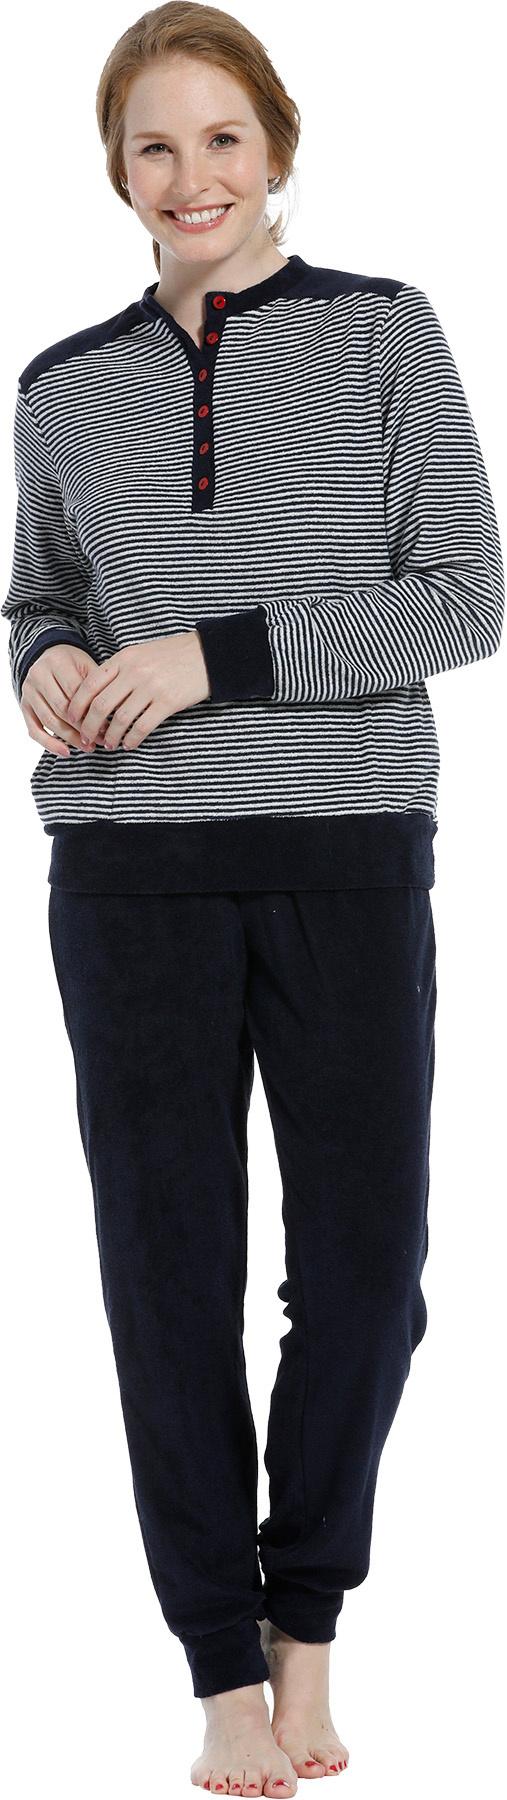 Pastunette badstof dames pyjama NOS